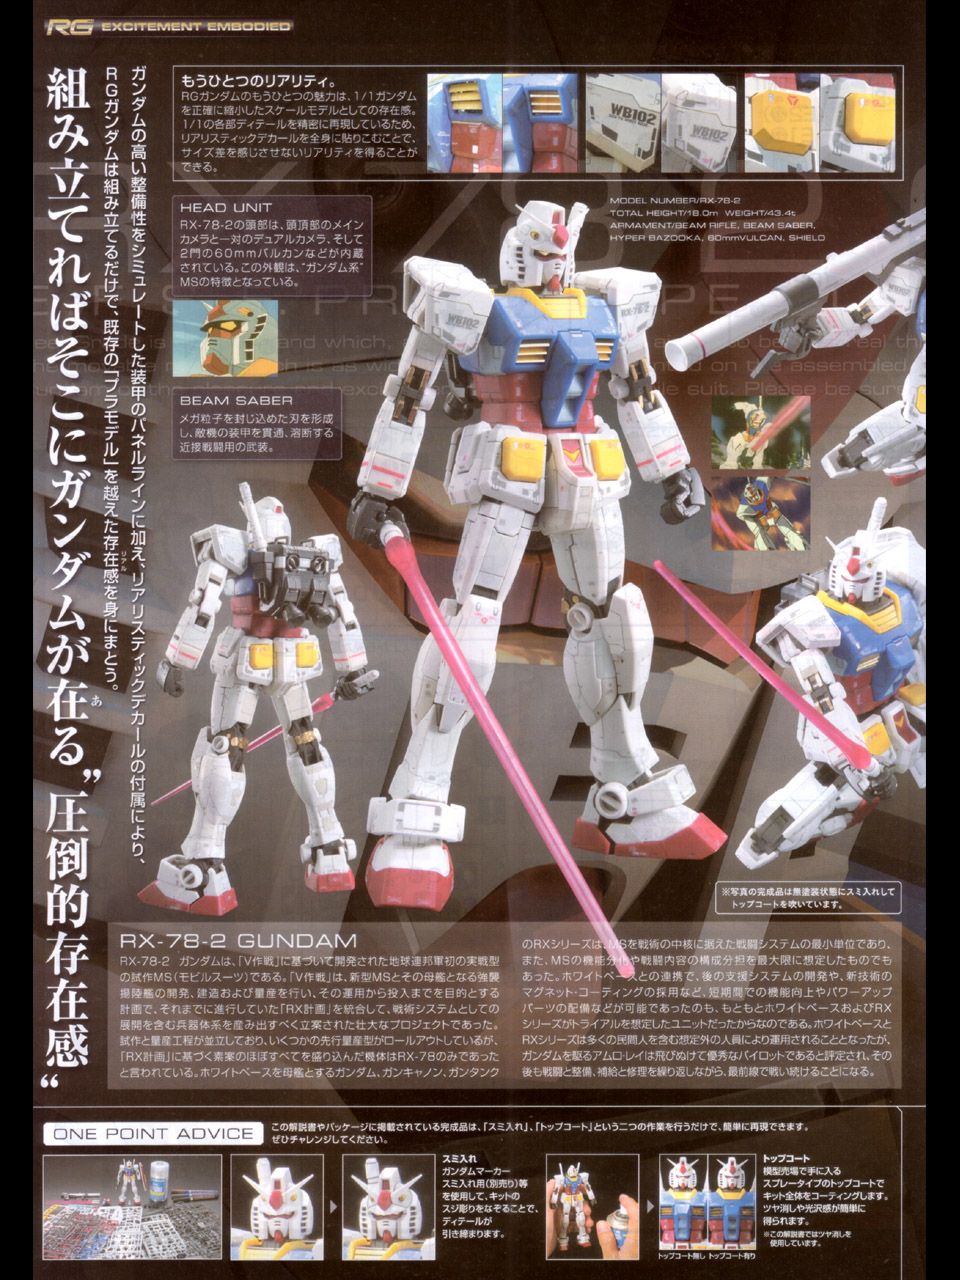 RG_RX78_2_Gundam_08.jpg